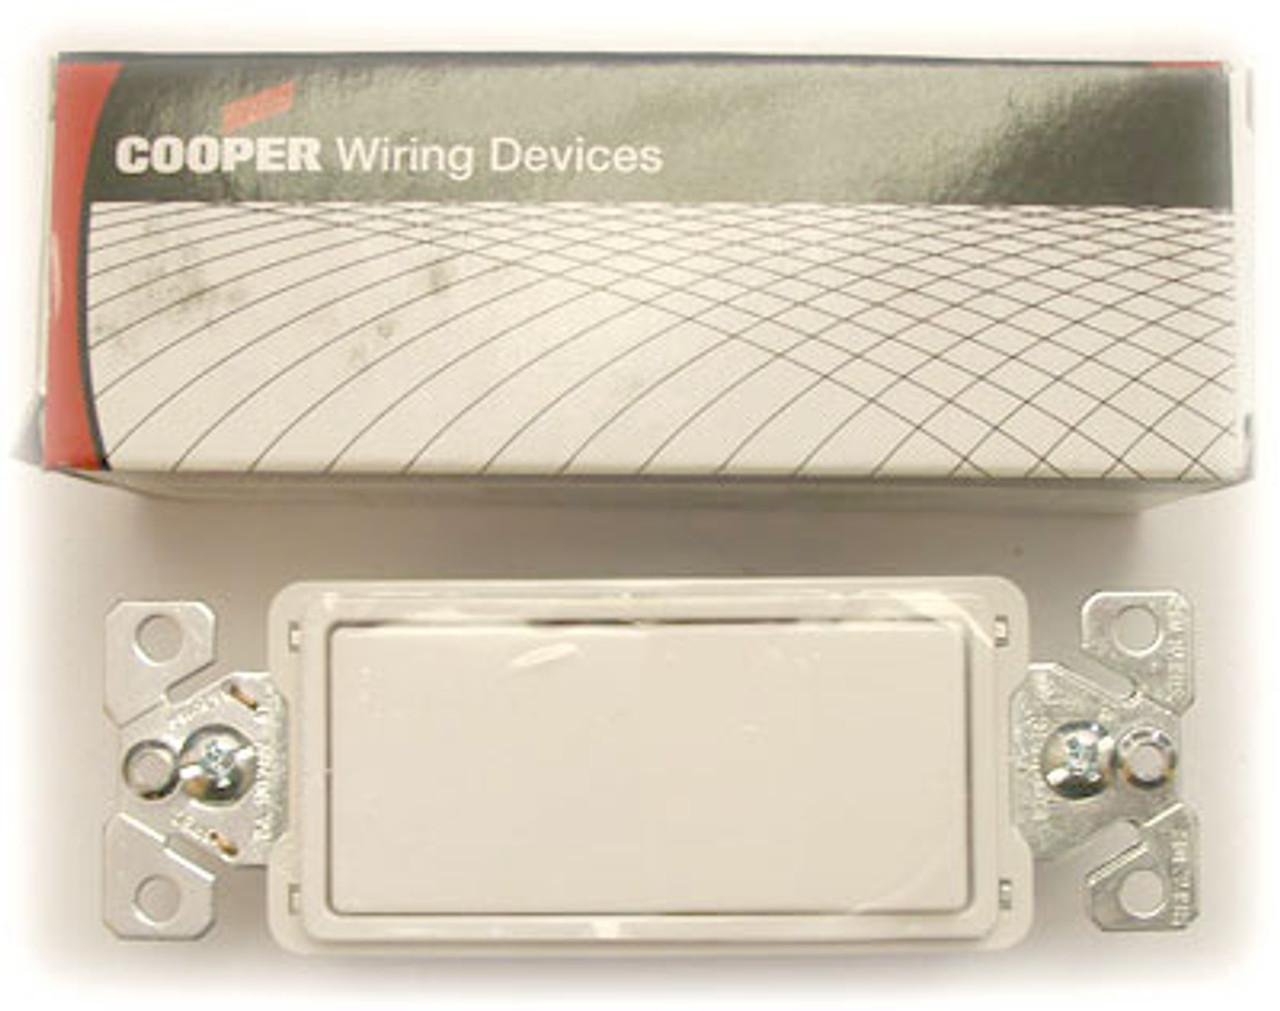 Cooper 7603W White Decorative Commericial Switch - New